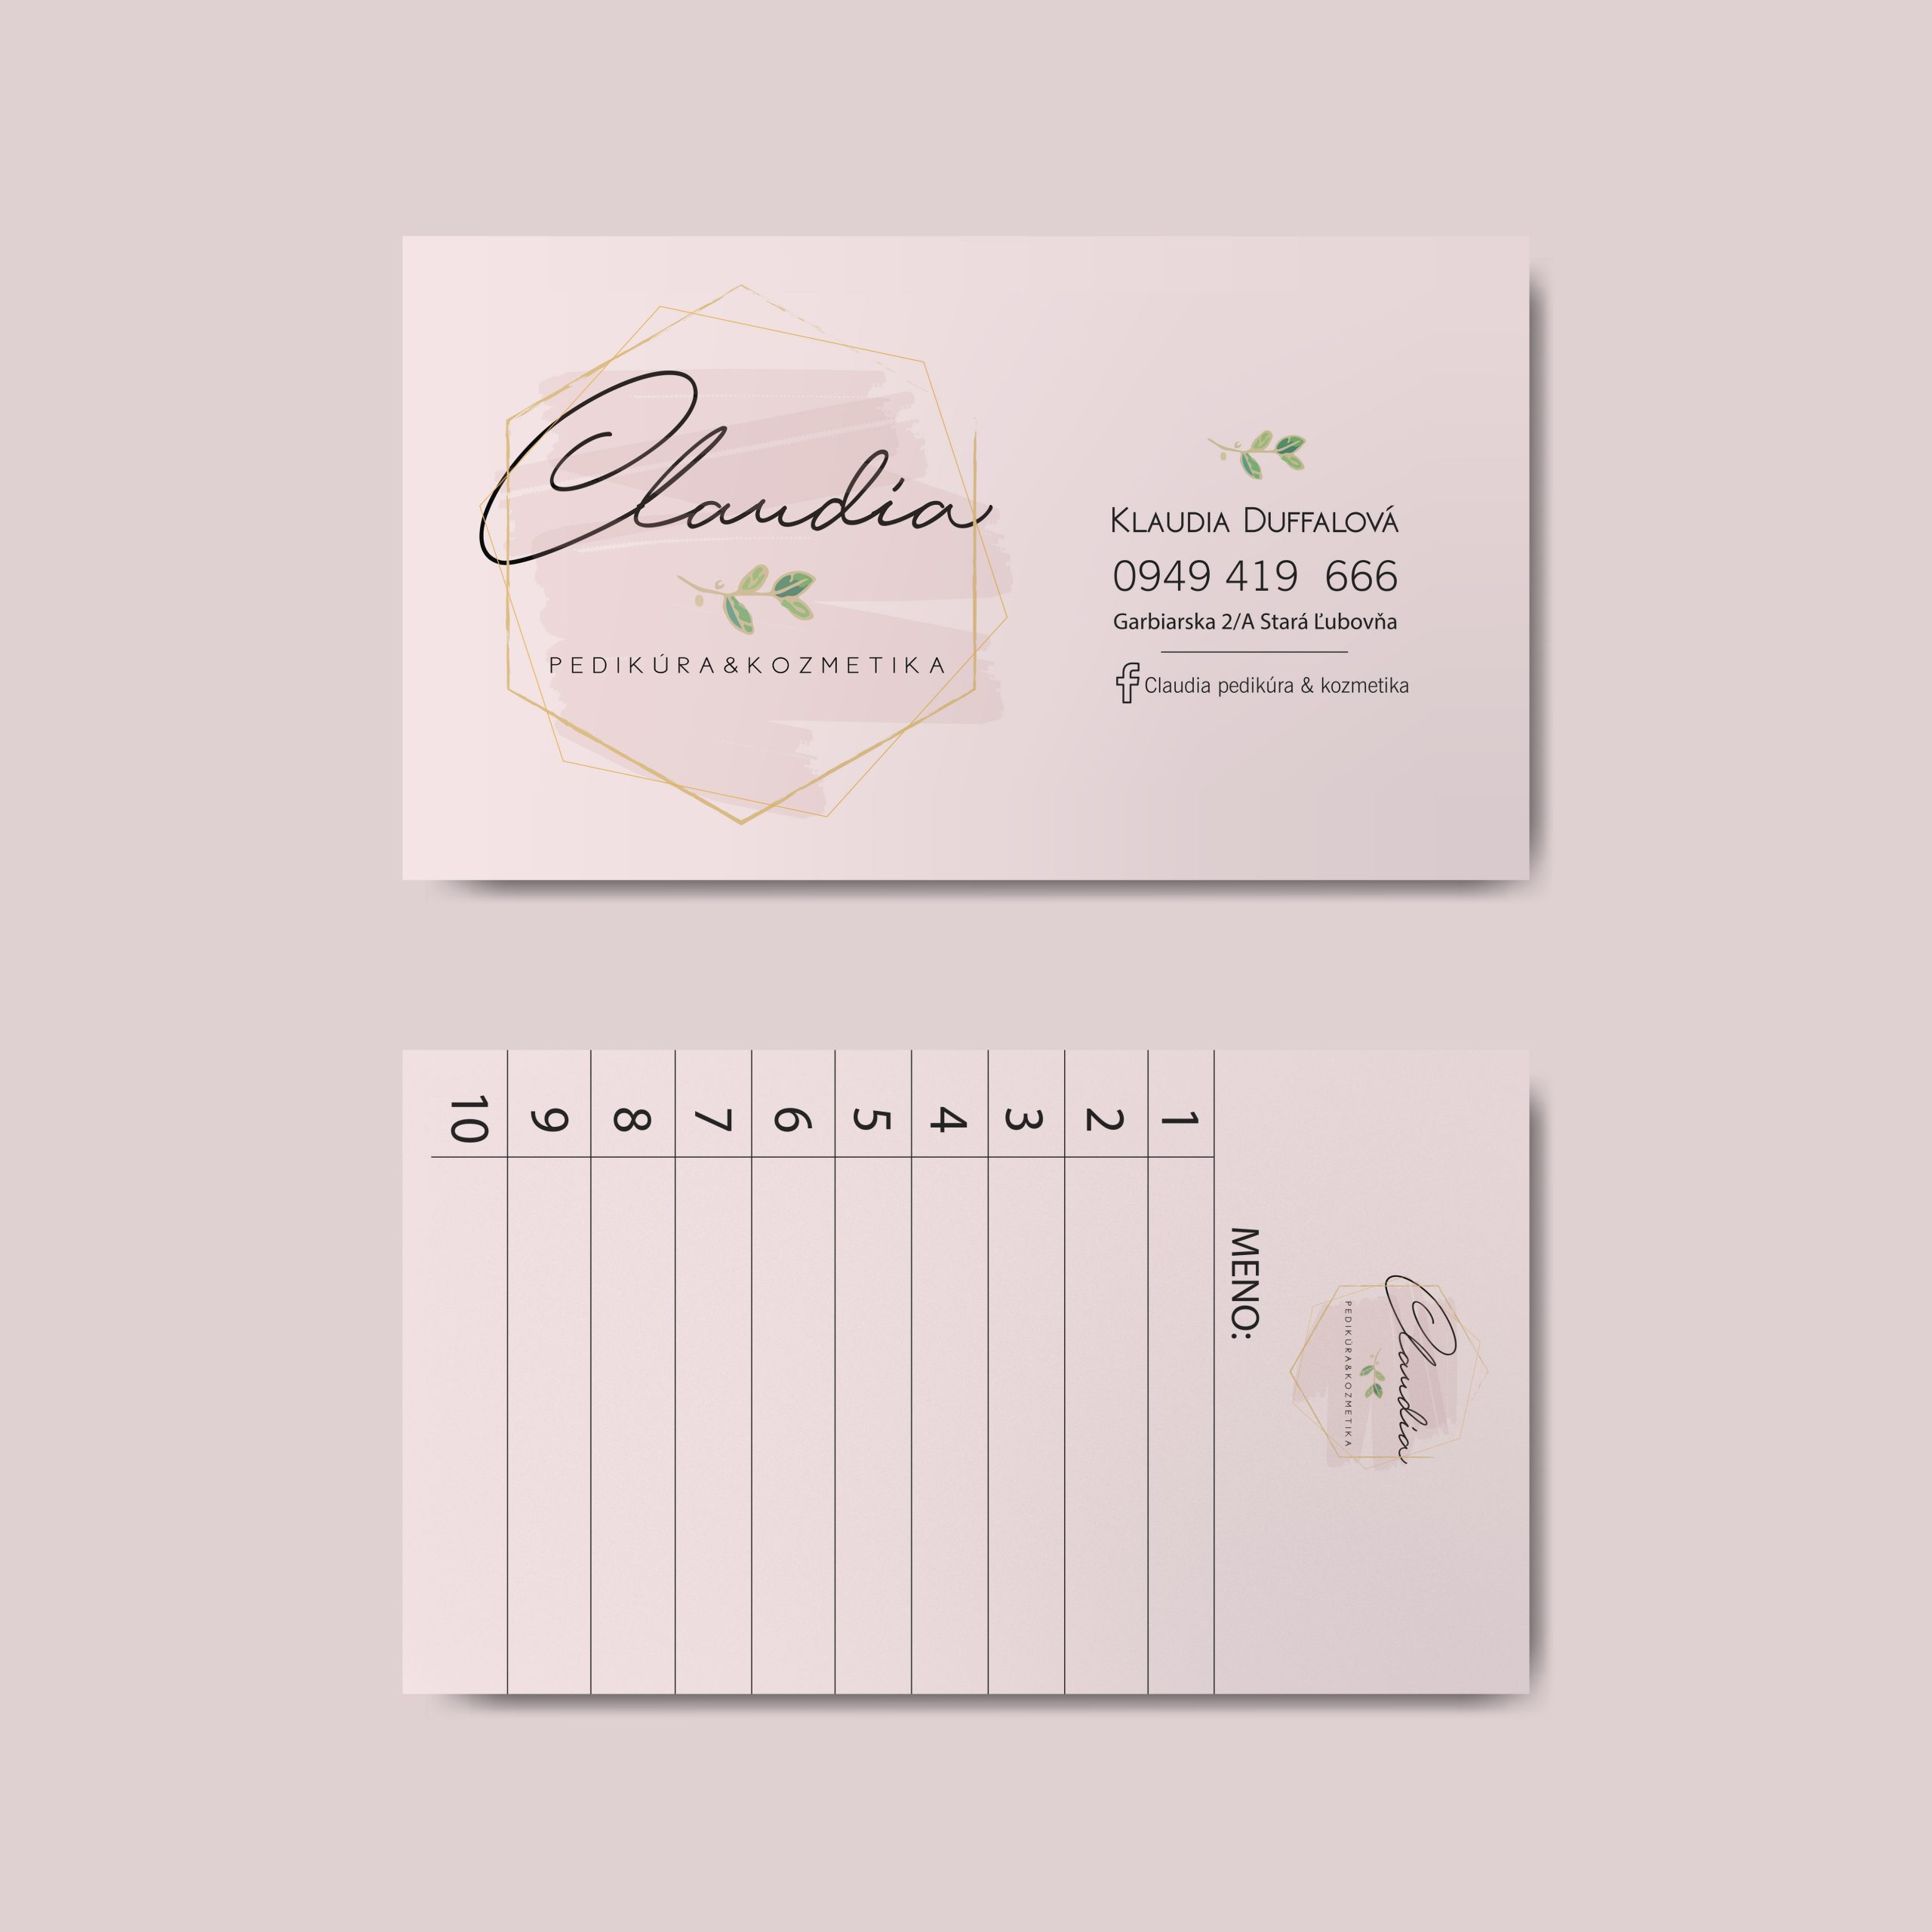 Blank business card design mockup vector